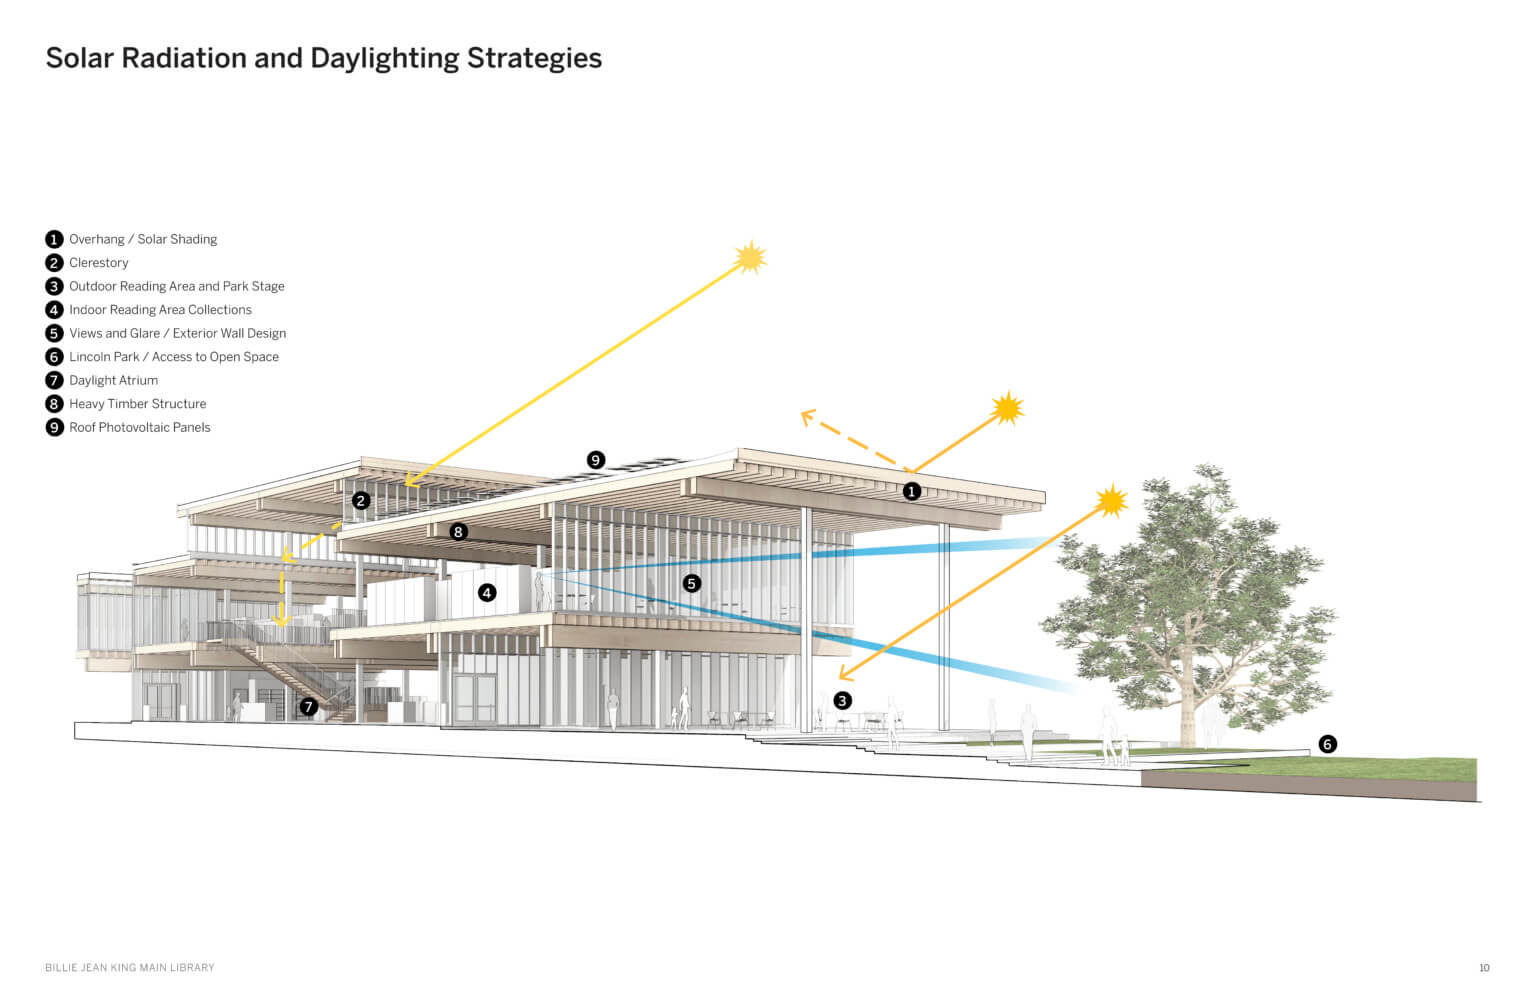 BJK-Main-Library_Solar-Diagram_jpg-1536x994